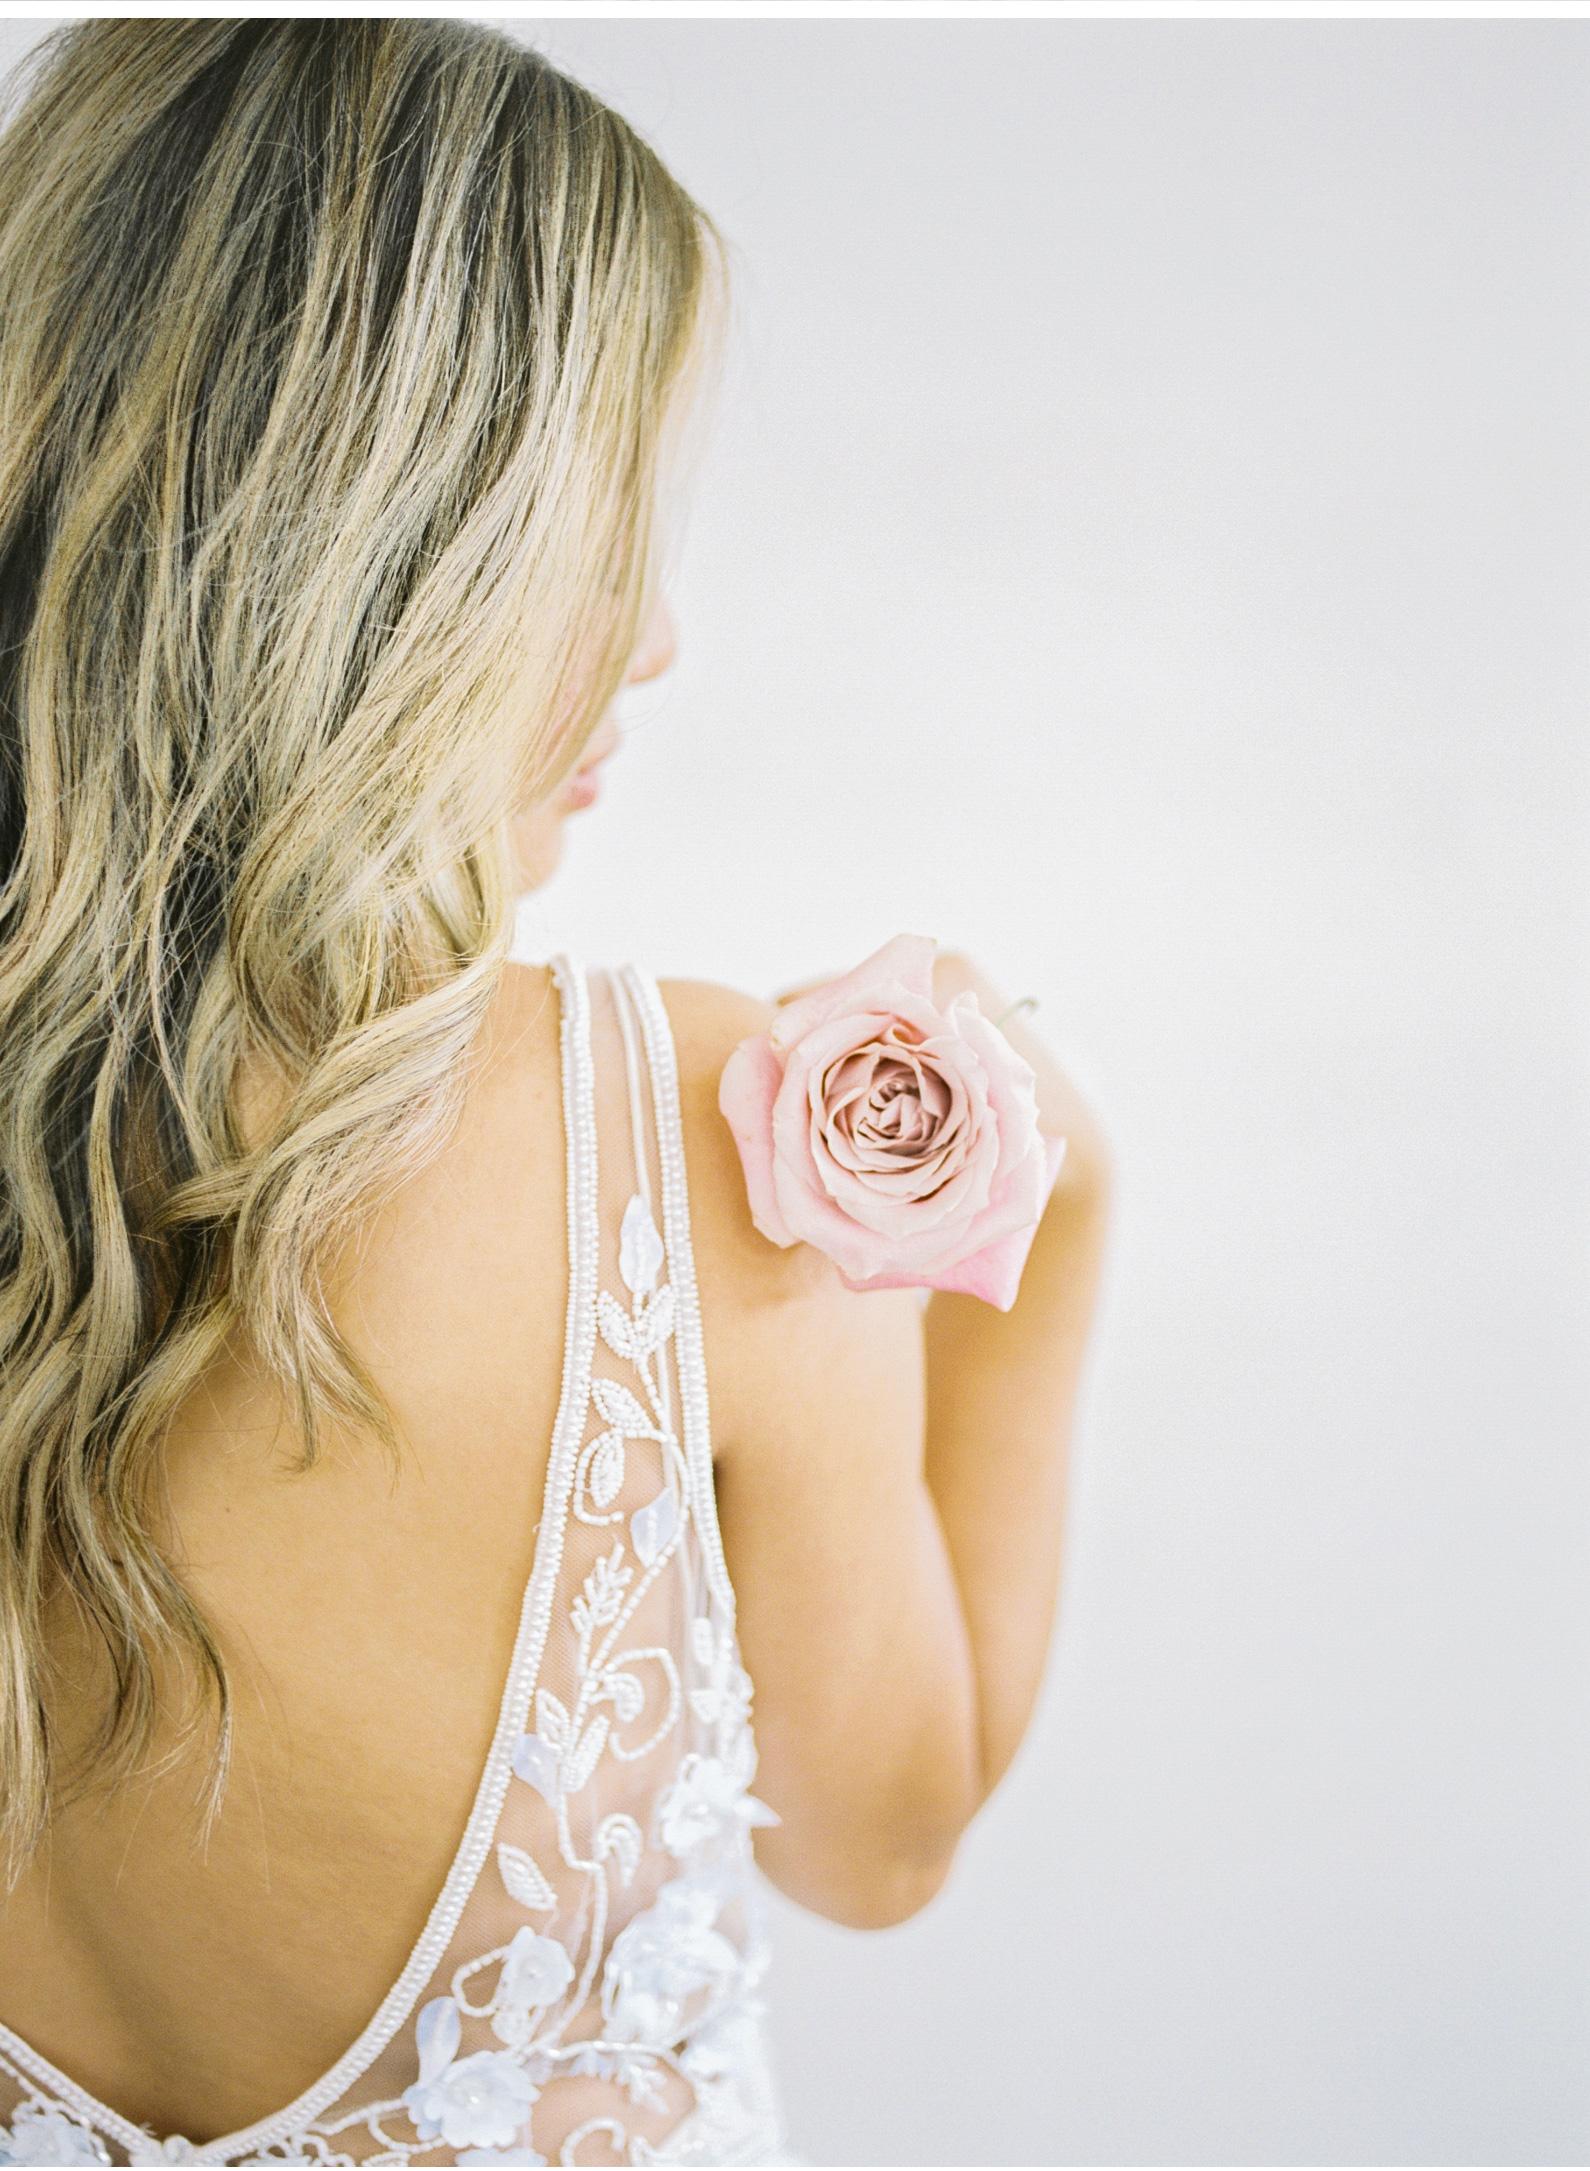 Malibu-Wedding-Photographer-Natalie-Schutt-Photography-Inspired-by-This_06.jpg